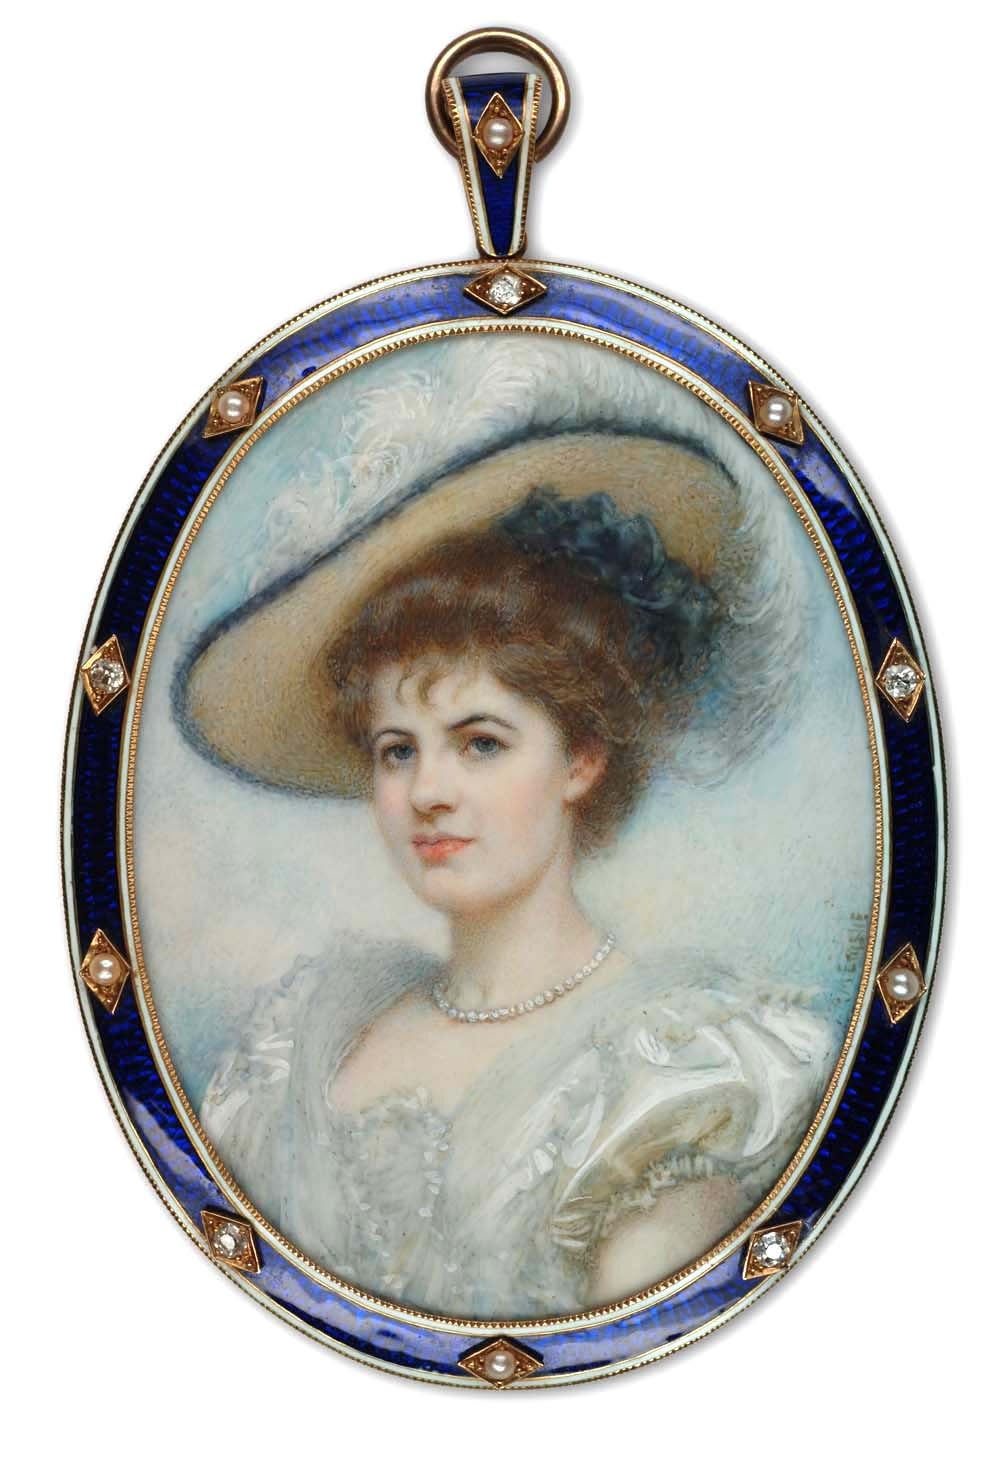 A Private Portrait Miniature Collection 19th Century